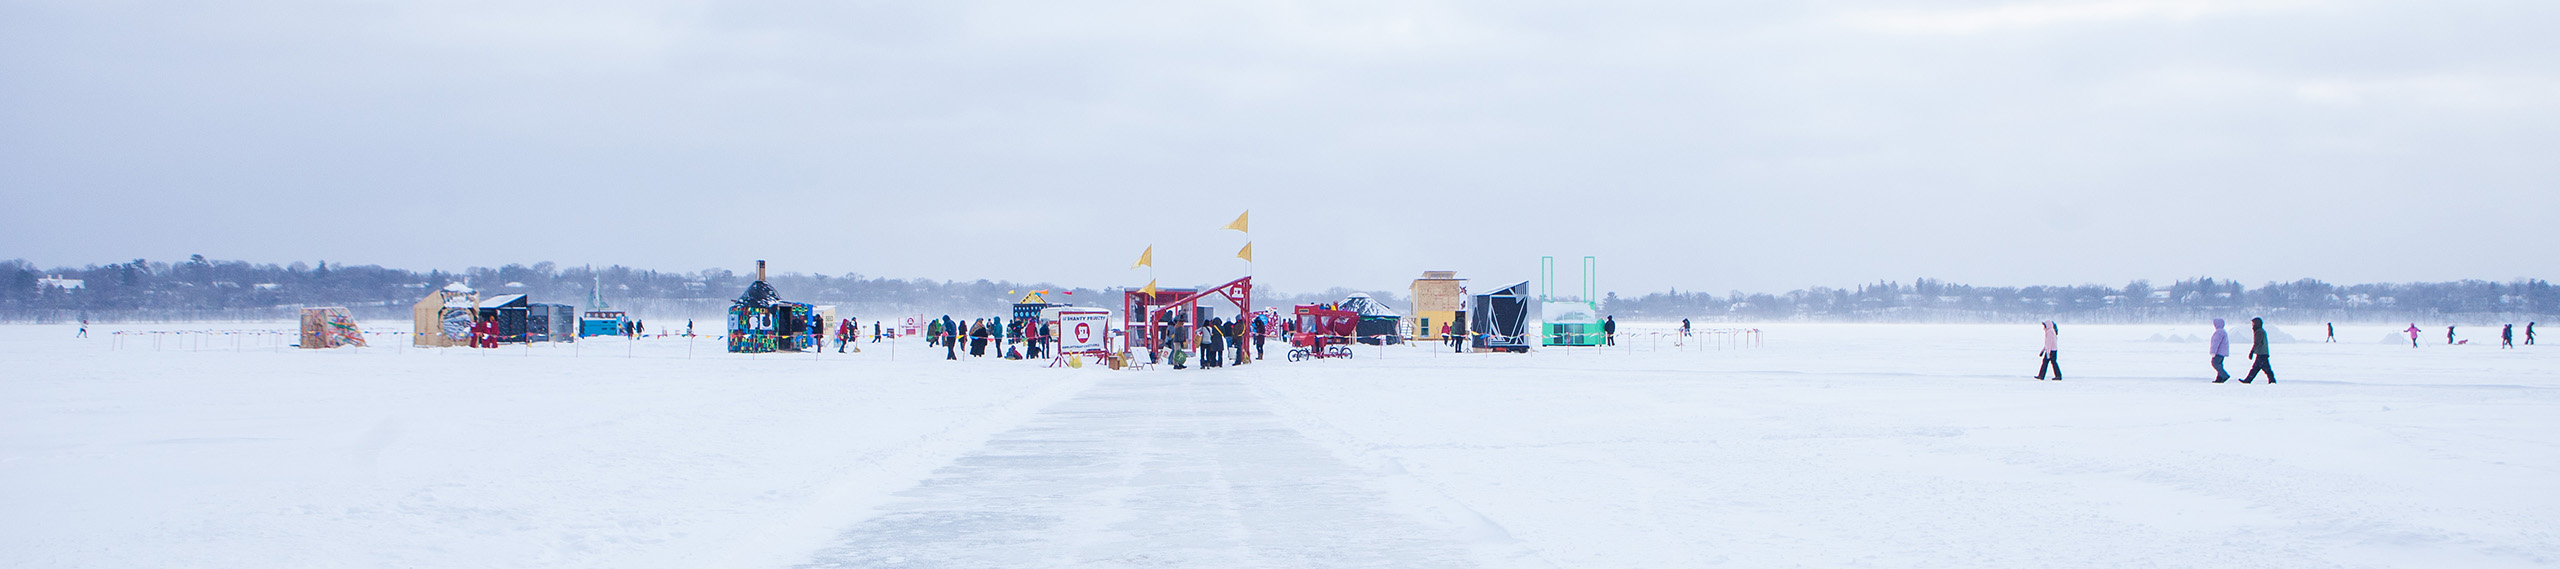 Horizon shot of the art shanty village on the frozen lake